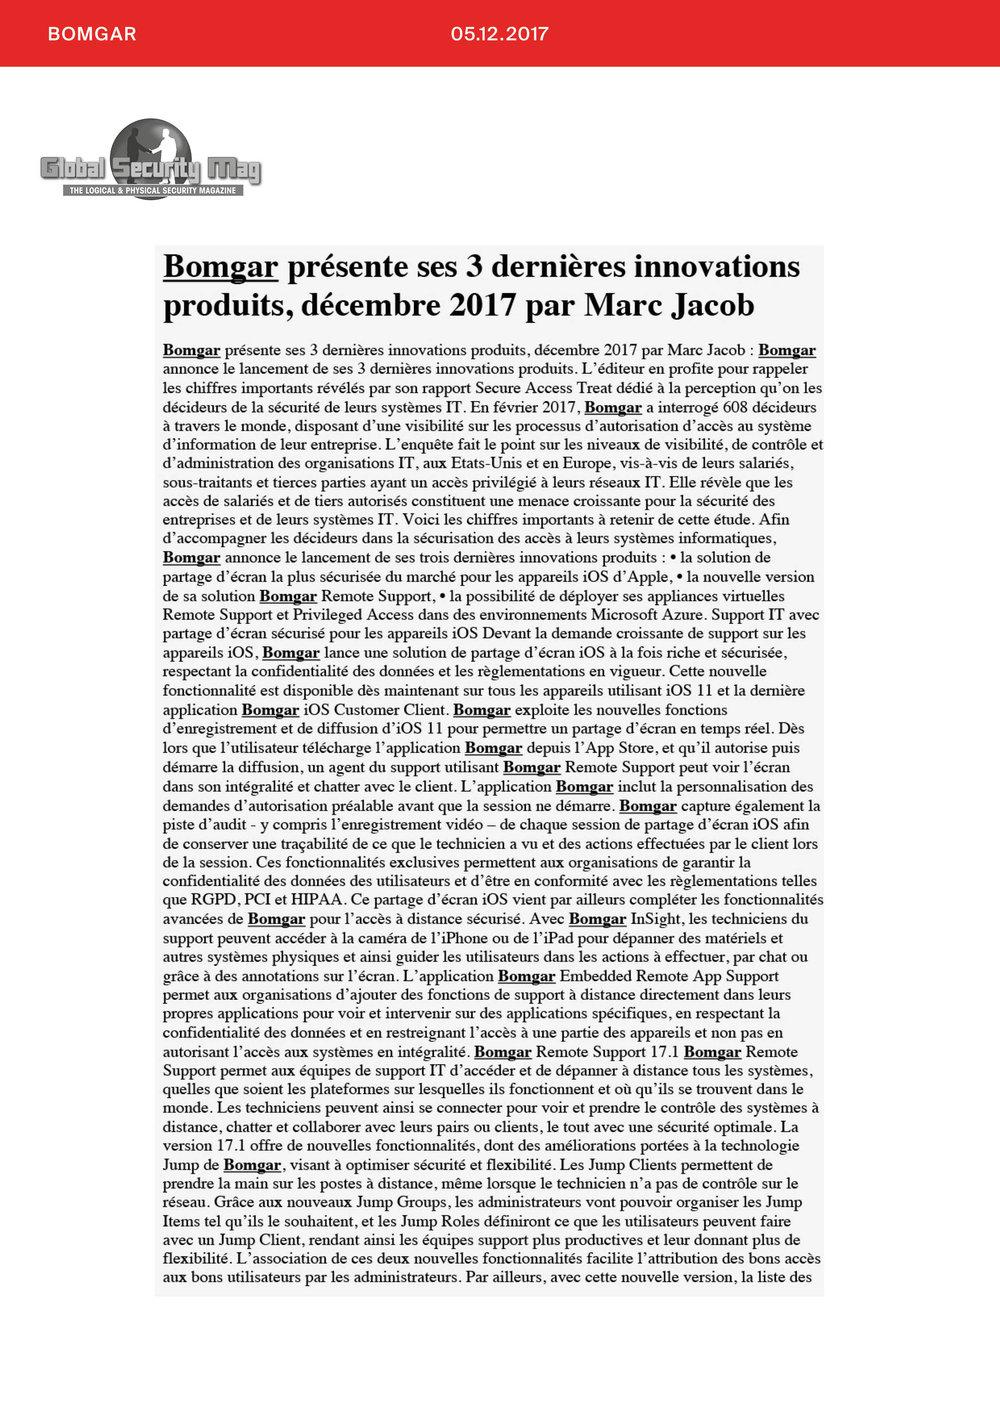 BOOKMEDIA_DEC5.jpg